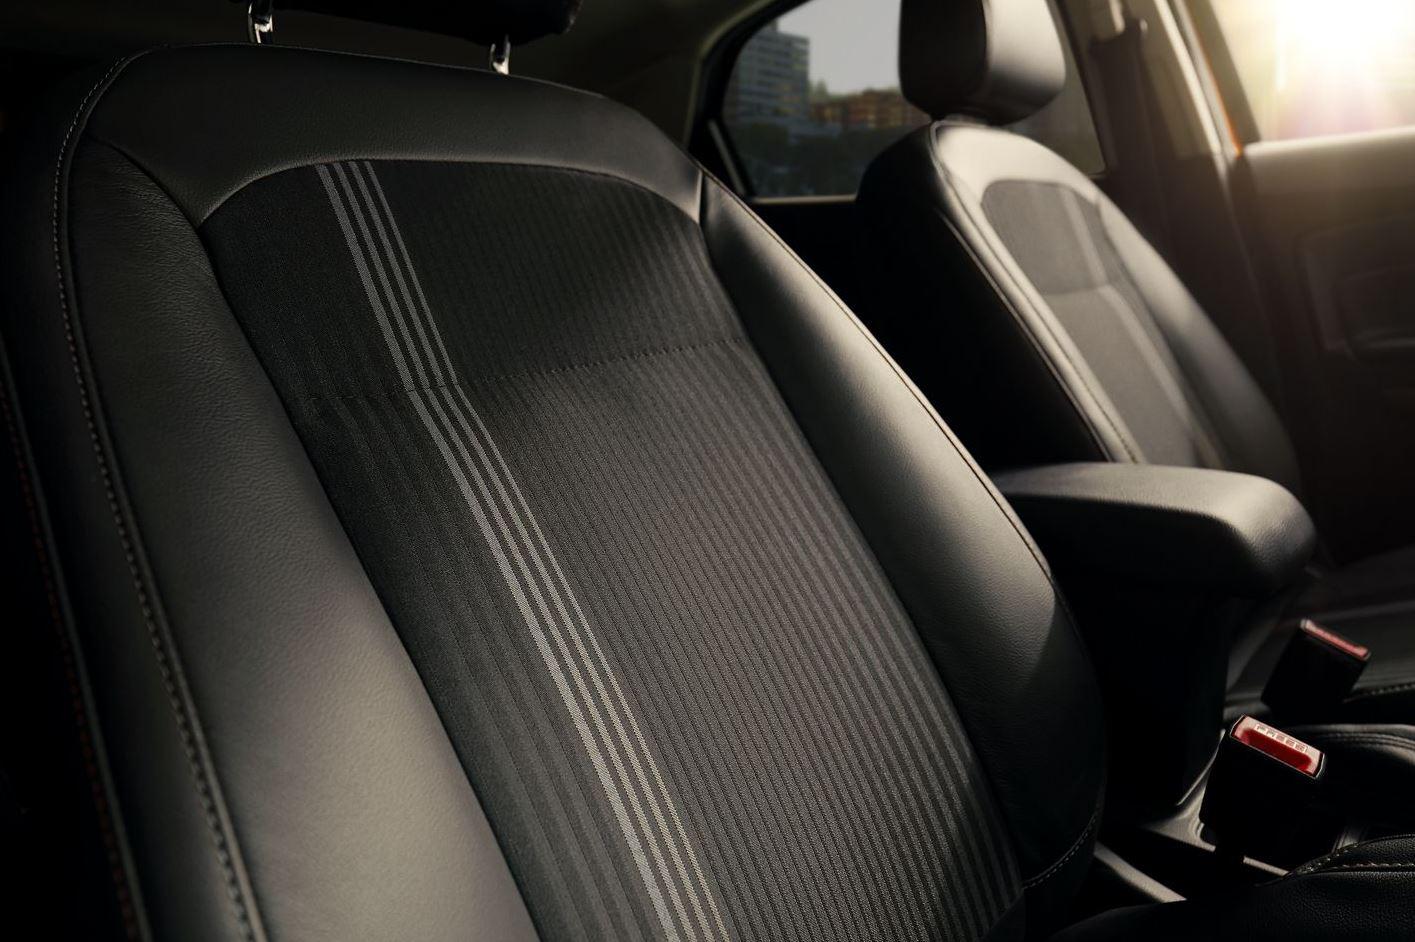 2019 Ford EcoSport Interior Detailing